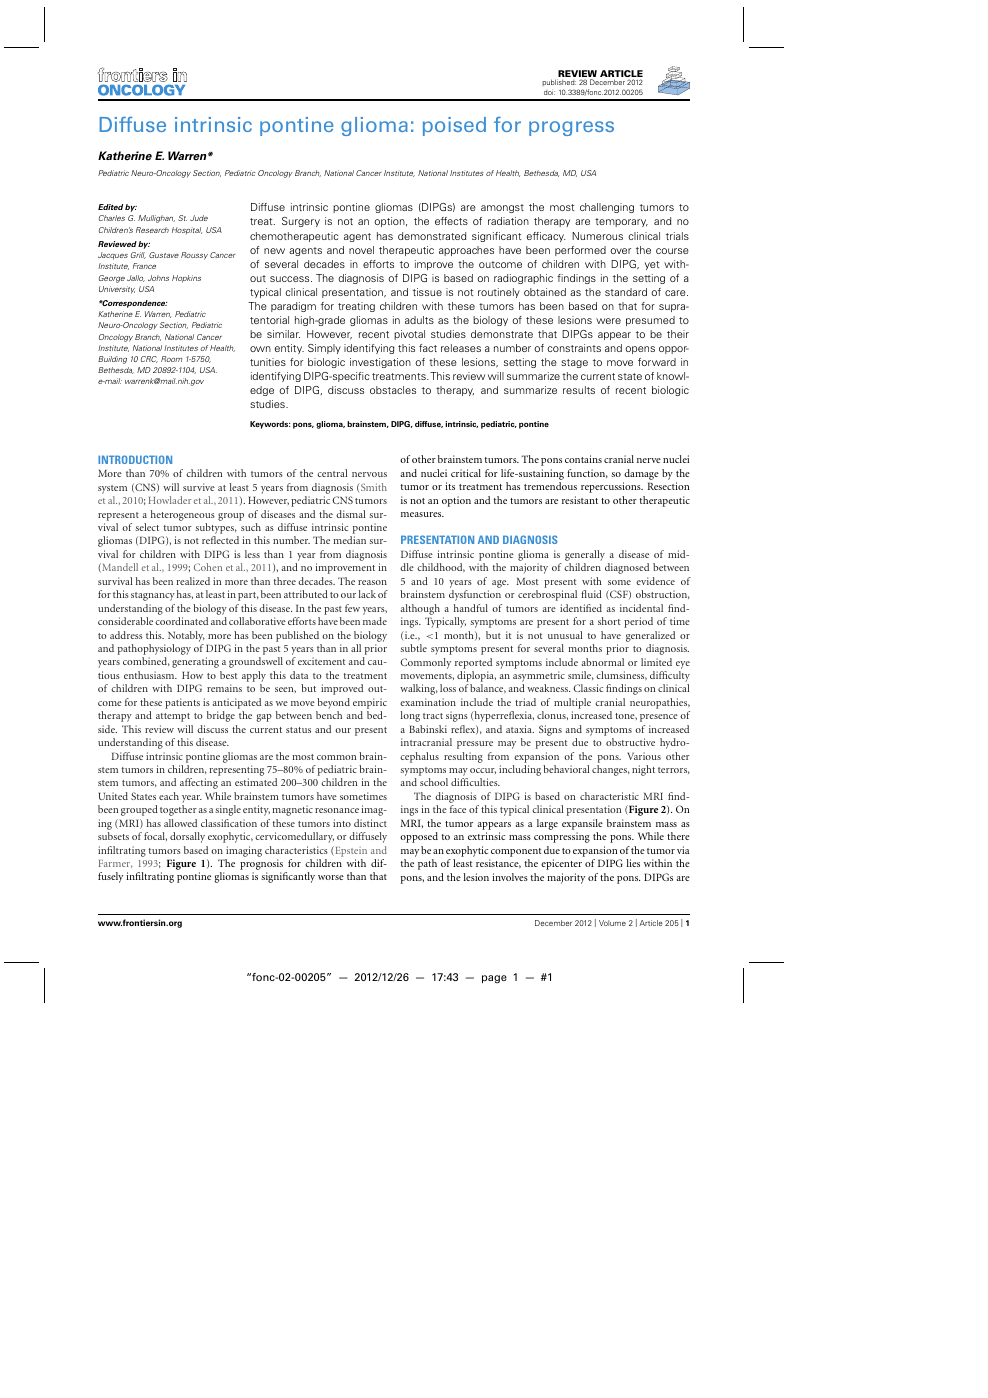 Diffuse intrinsic pontine glioma: poised for progress